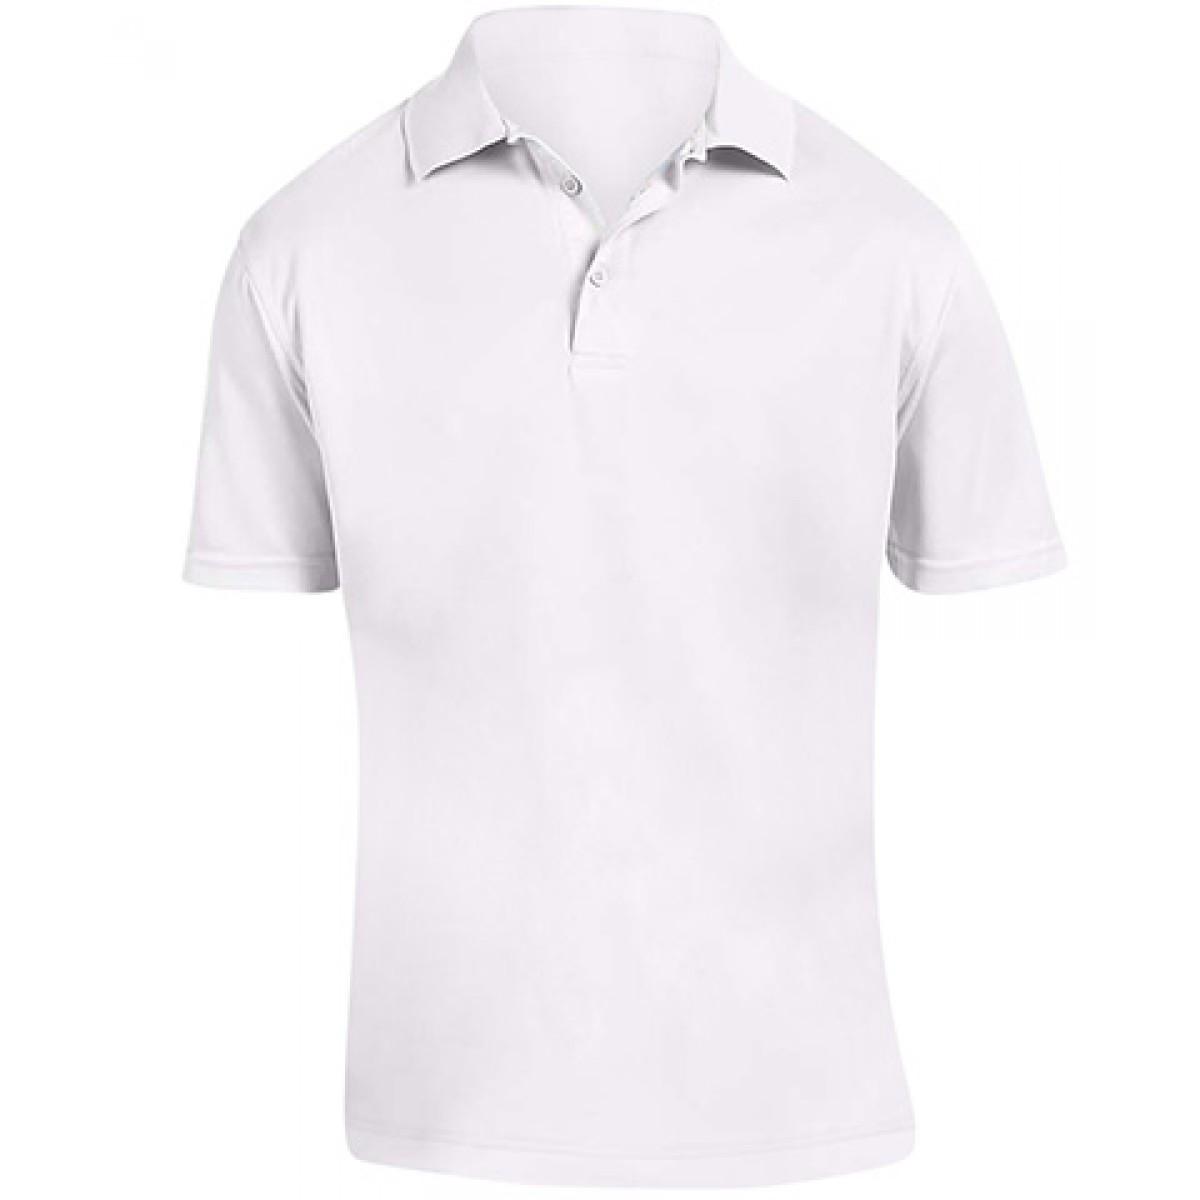 Men's 4 oz. Polytech Polo-White-S